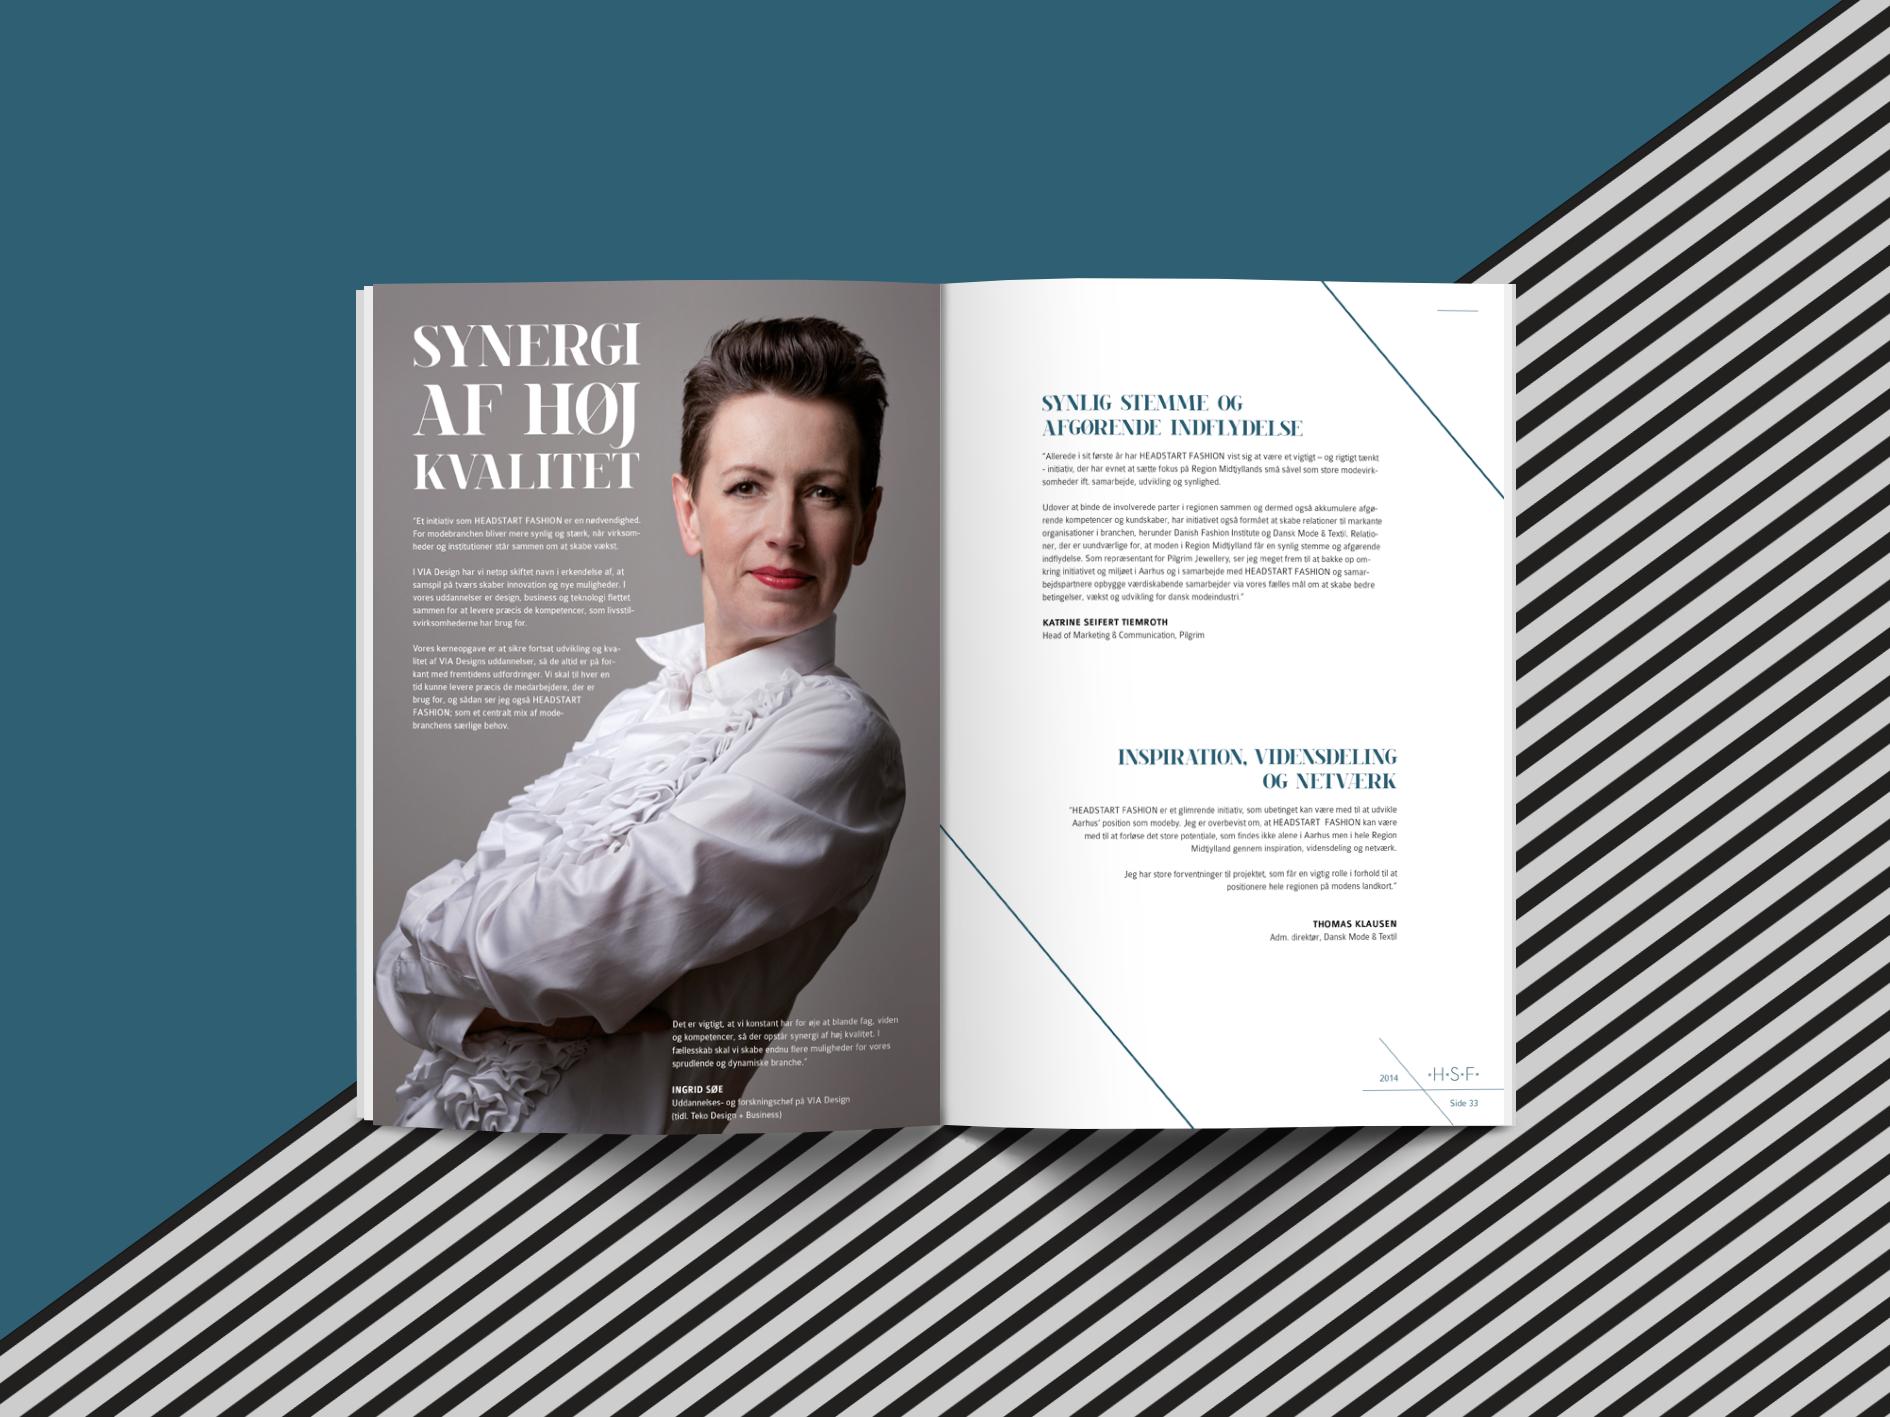 headstart_fashion_aarhus_magasin_grafiskdesign_krims_aarhus_maria_refsgaard_04